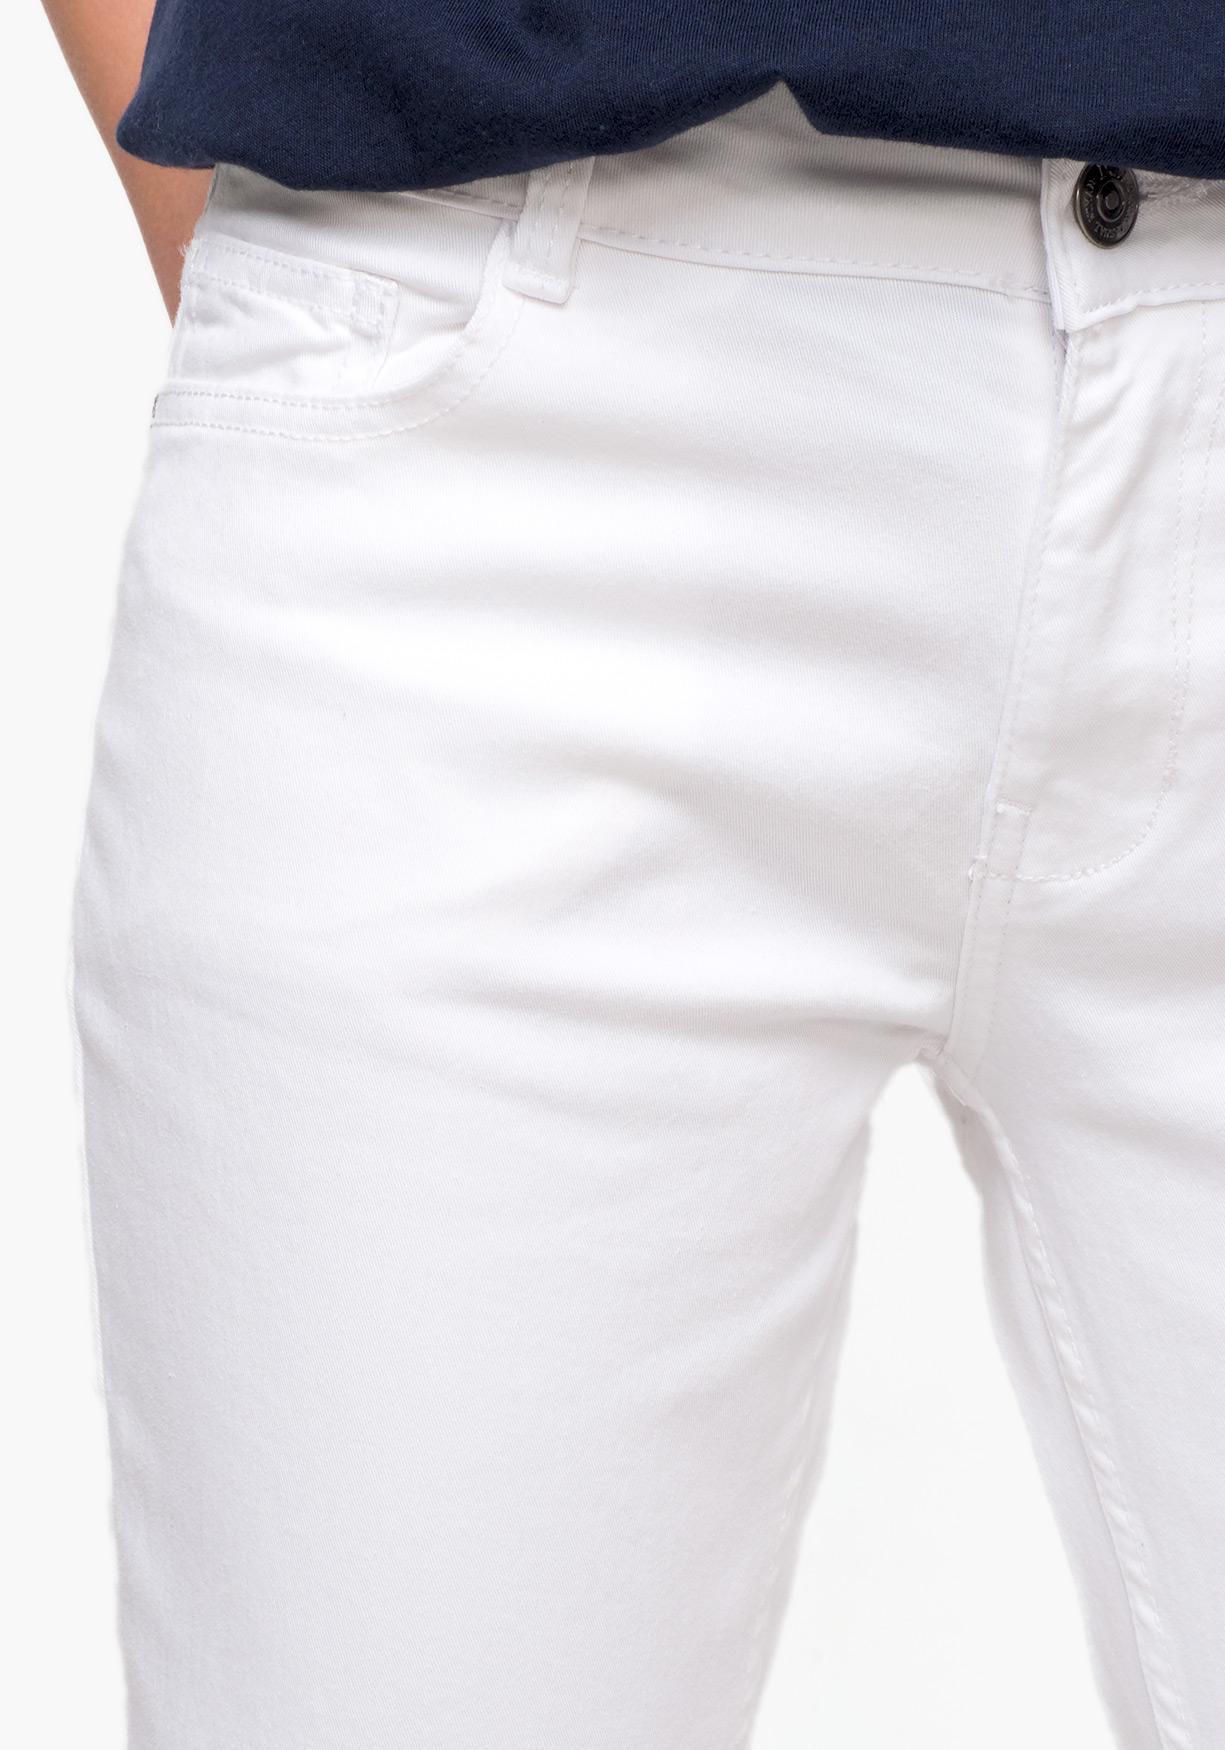 fc07ce085e044 De Pantalón Mujer Vaquero Slim Comprar Tex ¡aprovéchate Colores gE64wg